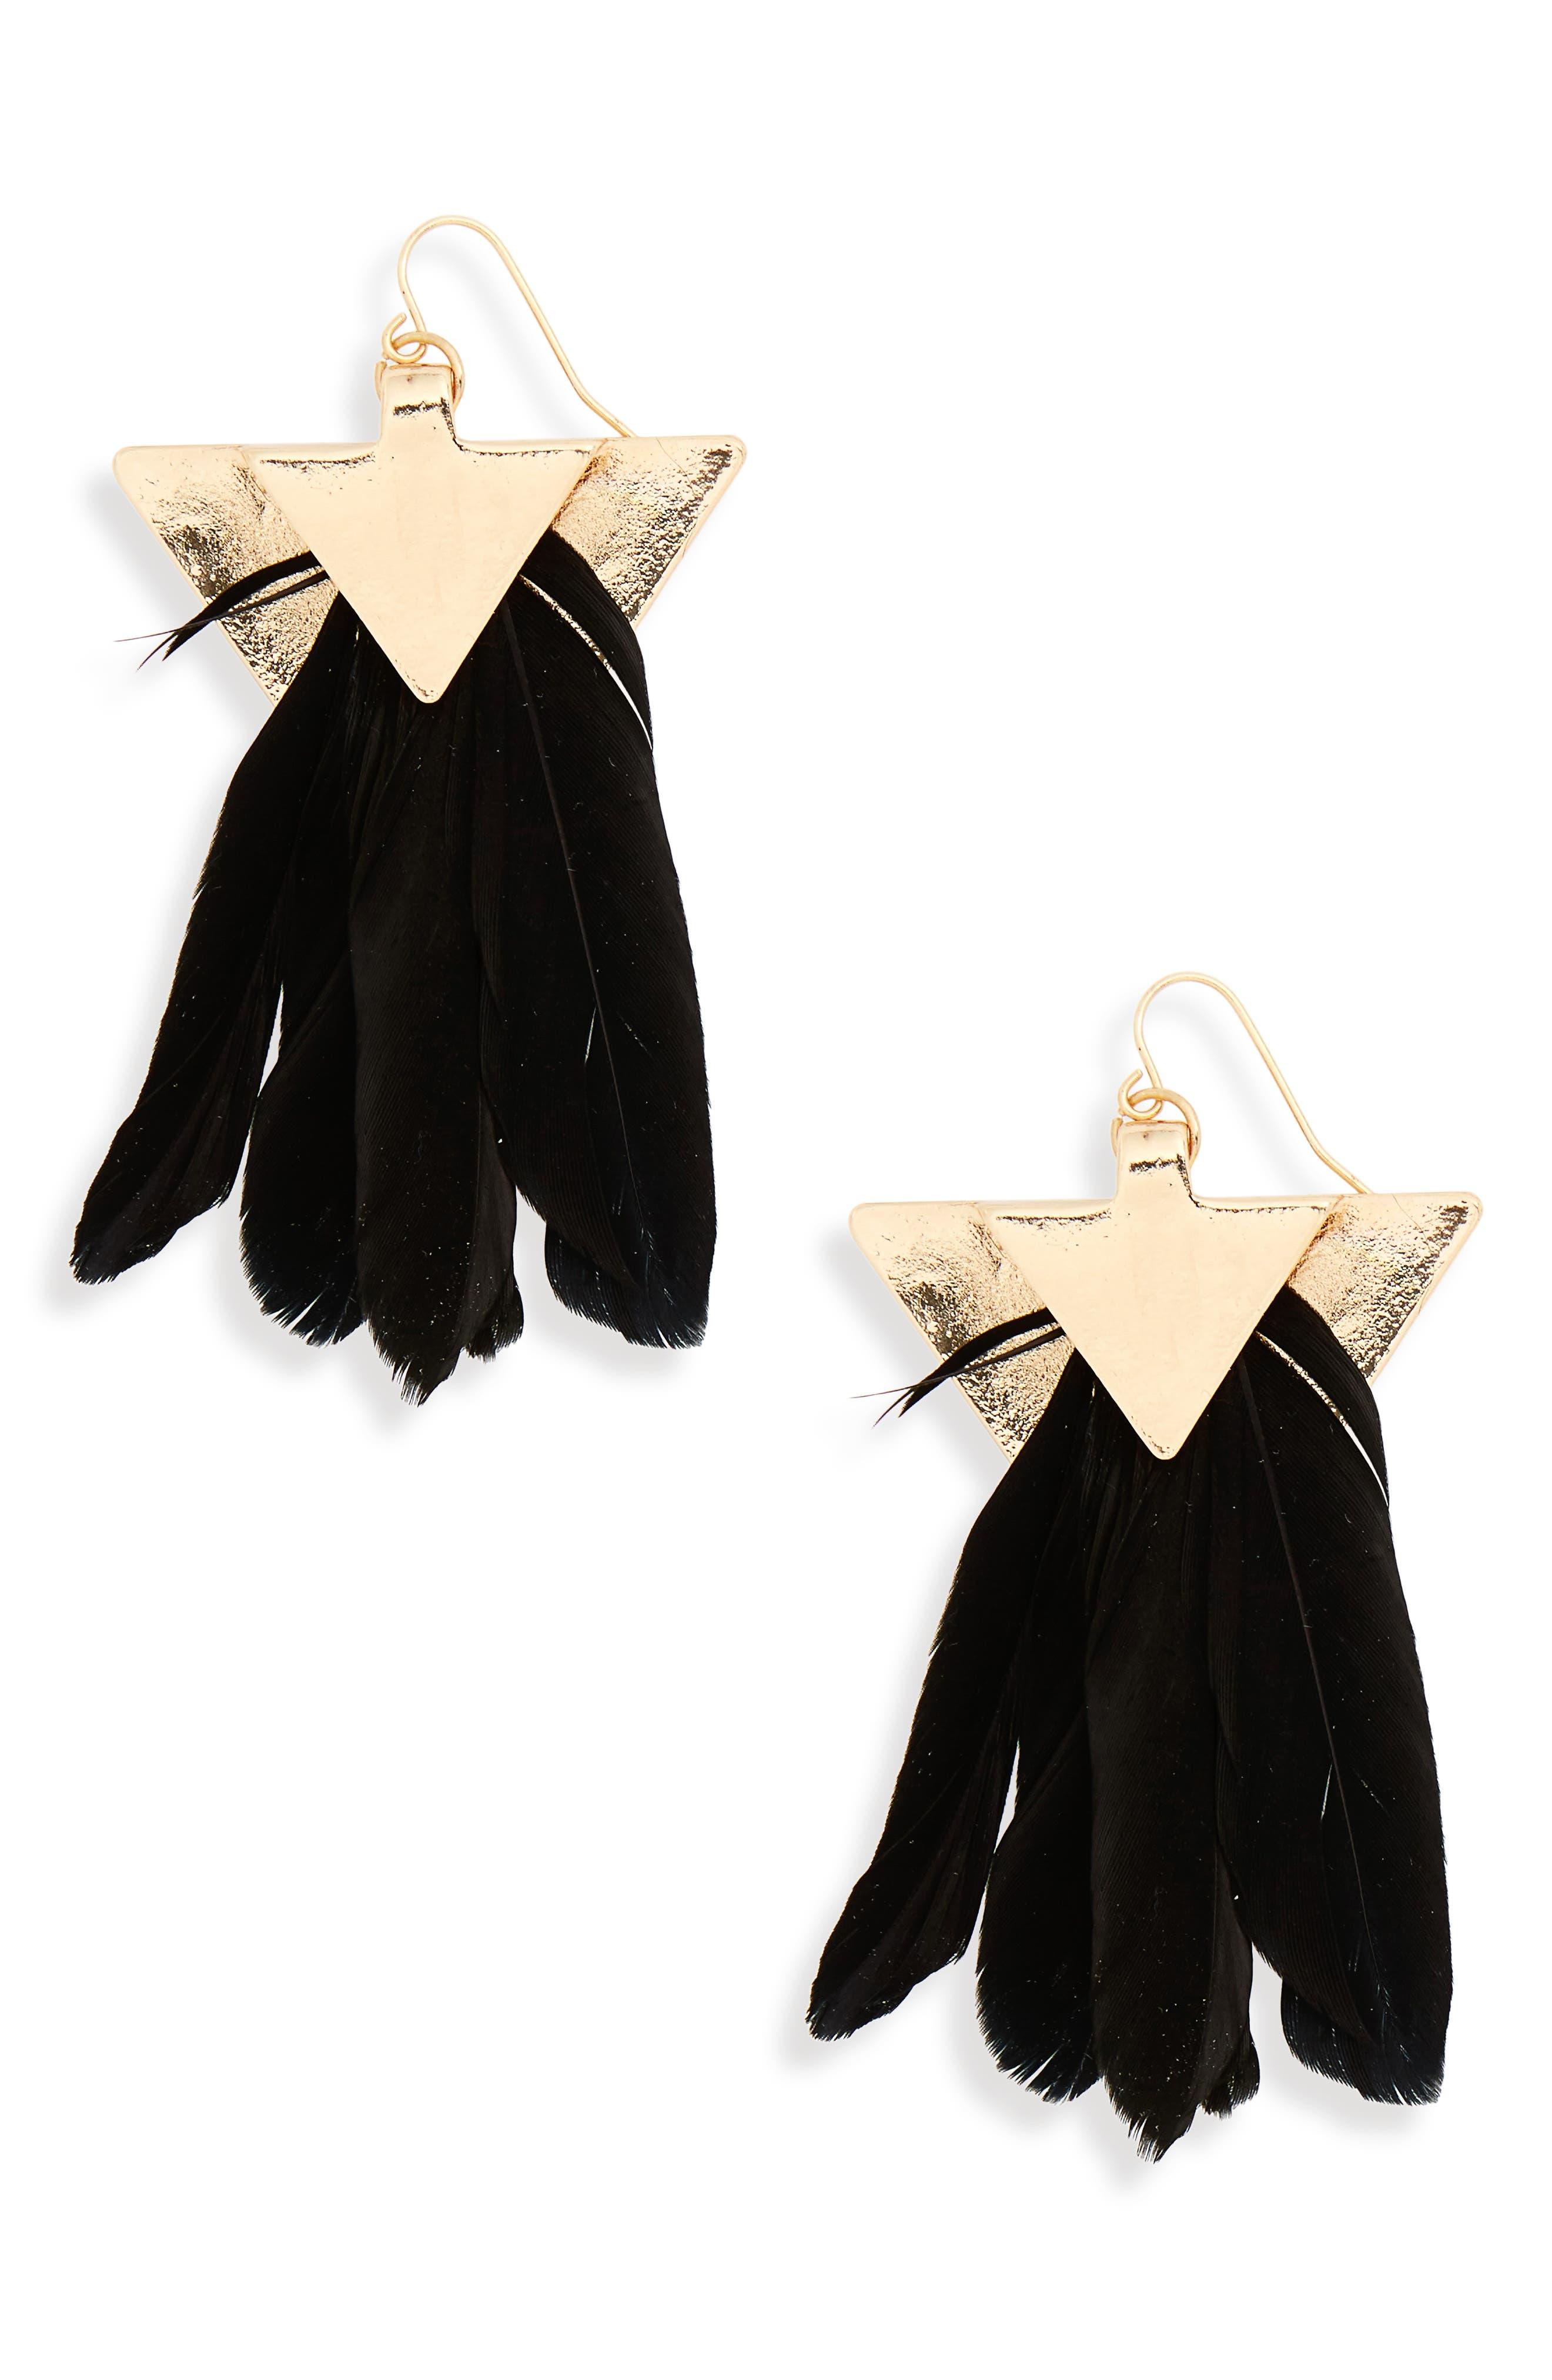 Feather Fan Earrings,                             Main thumbnail 1, color,                             Gold/ Black